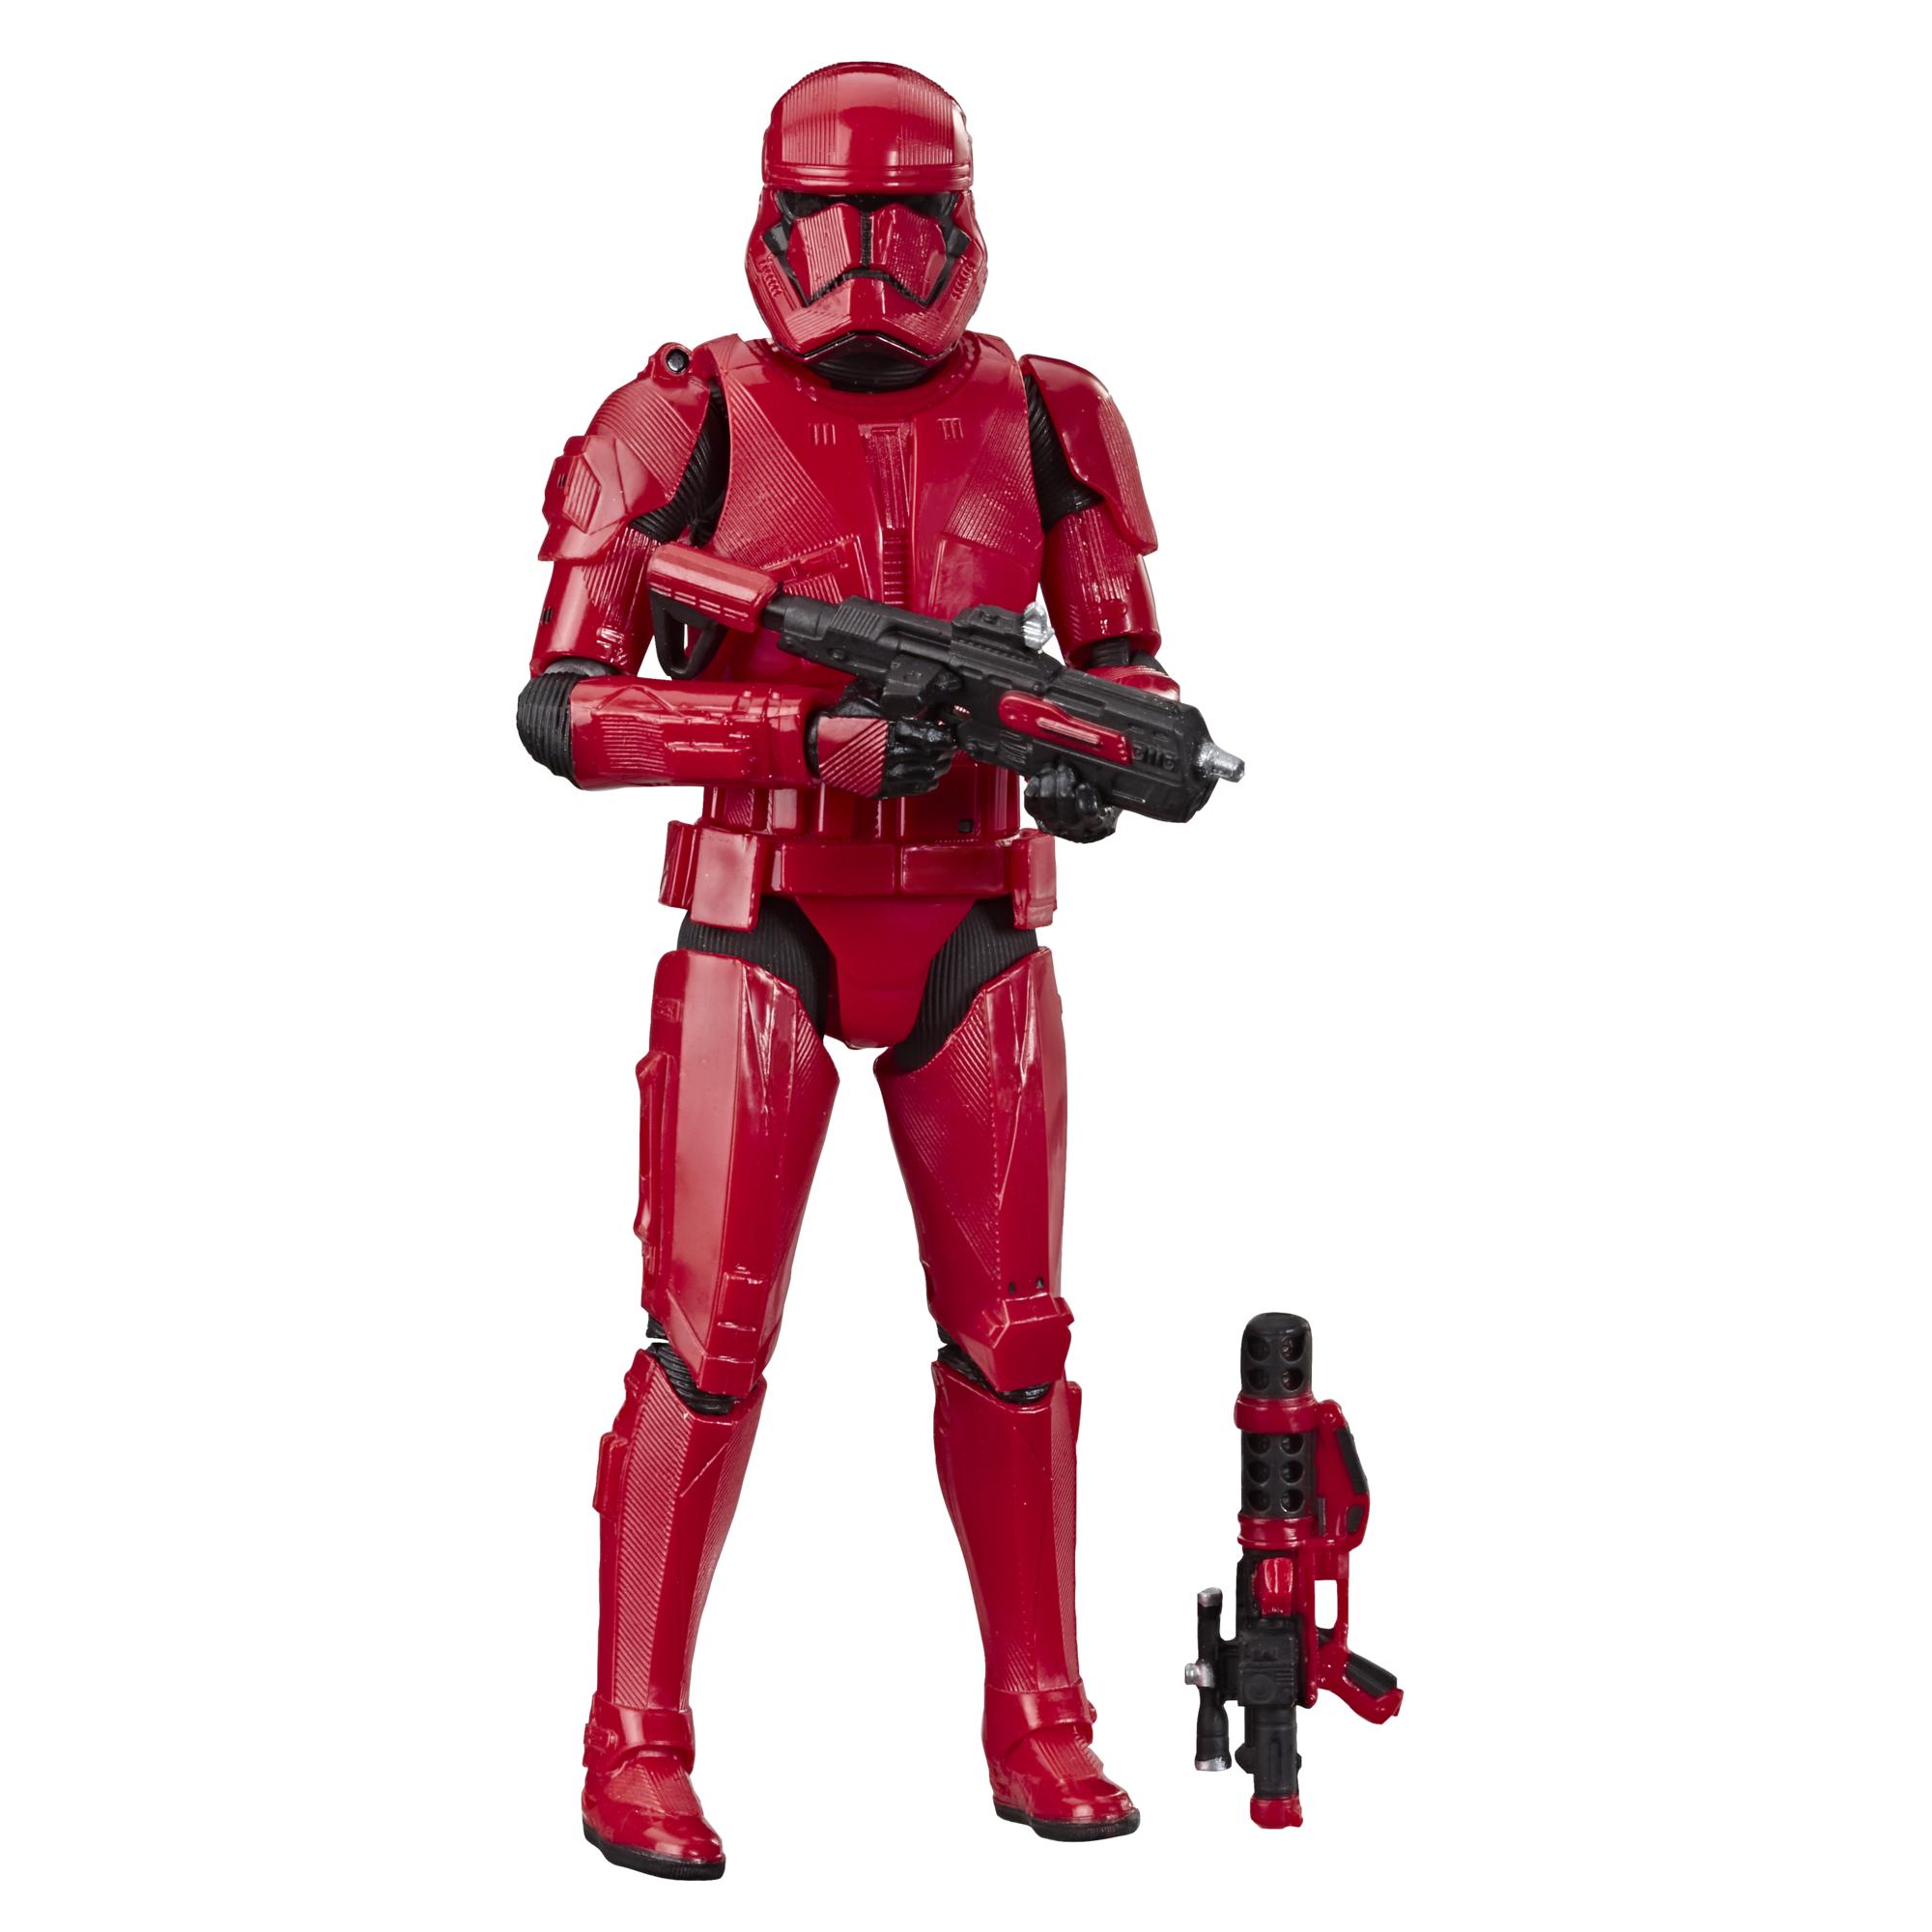 "Hasbro Star Wars Black Series: Sith Trooper 6"" Figure"